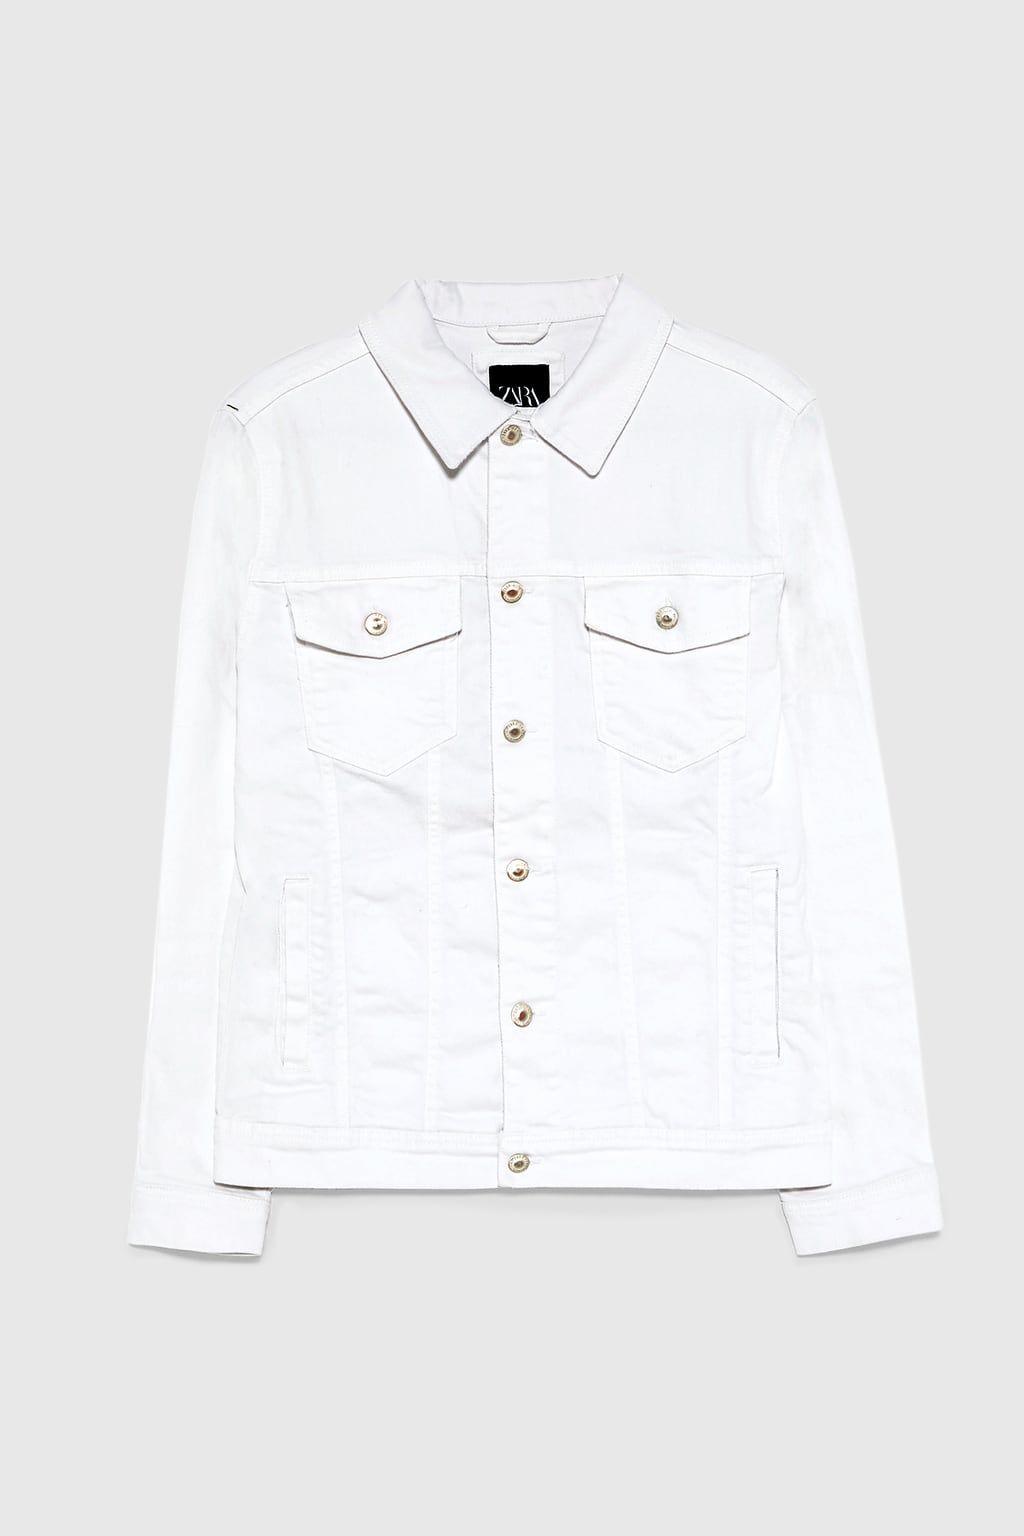 Soft Denim Jogging Pants View All Jeans Man Zara United States Men Shirt Style Denim Jacket Mens Shirts